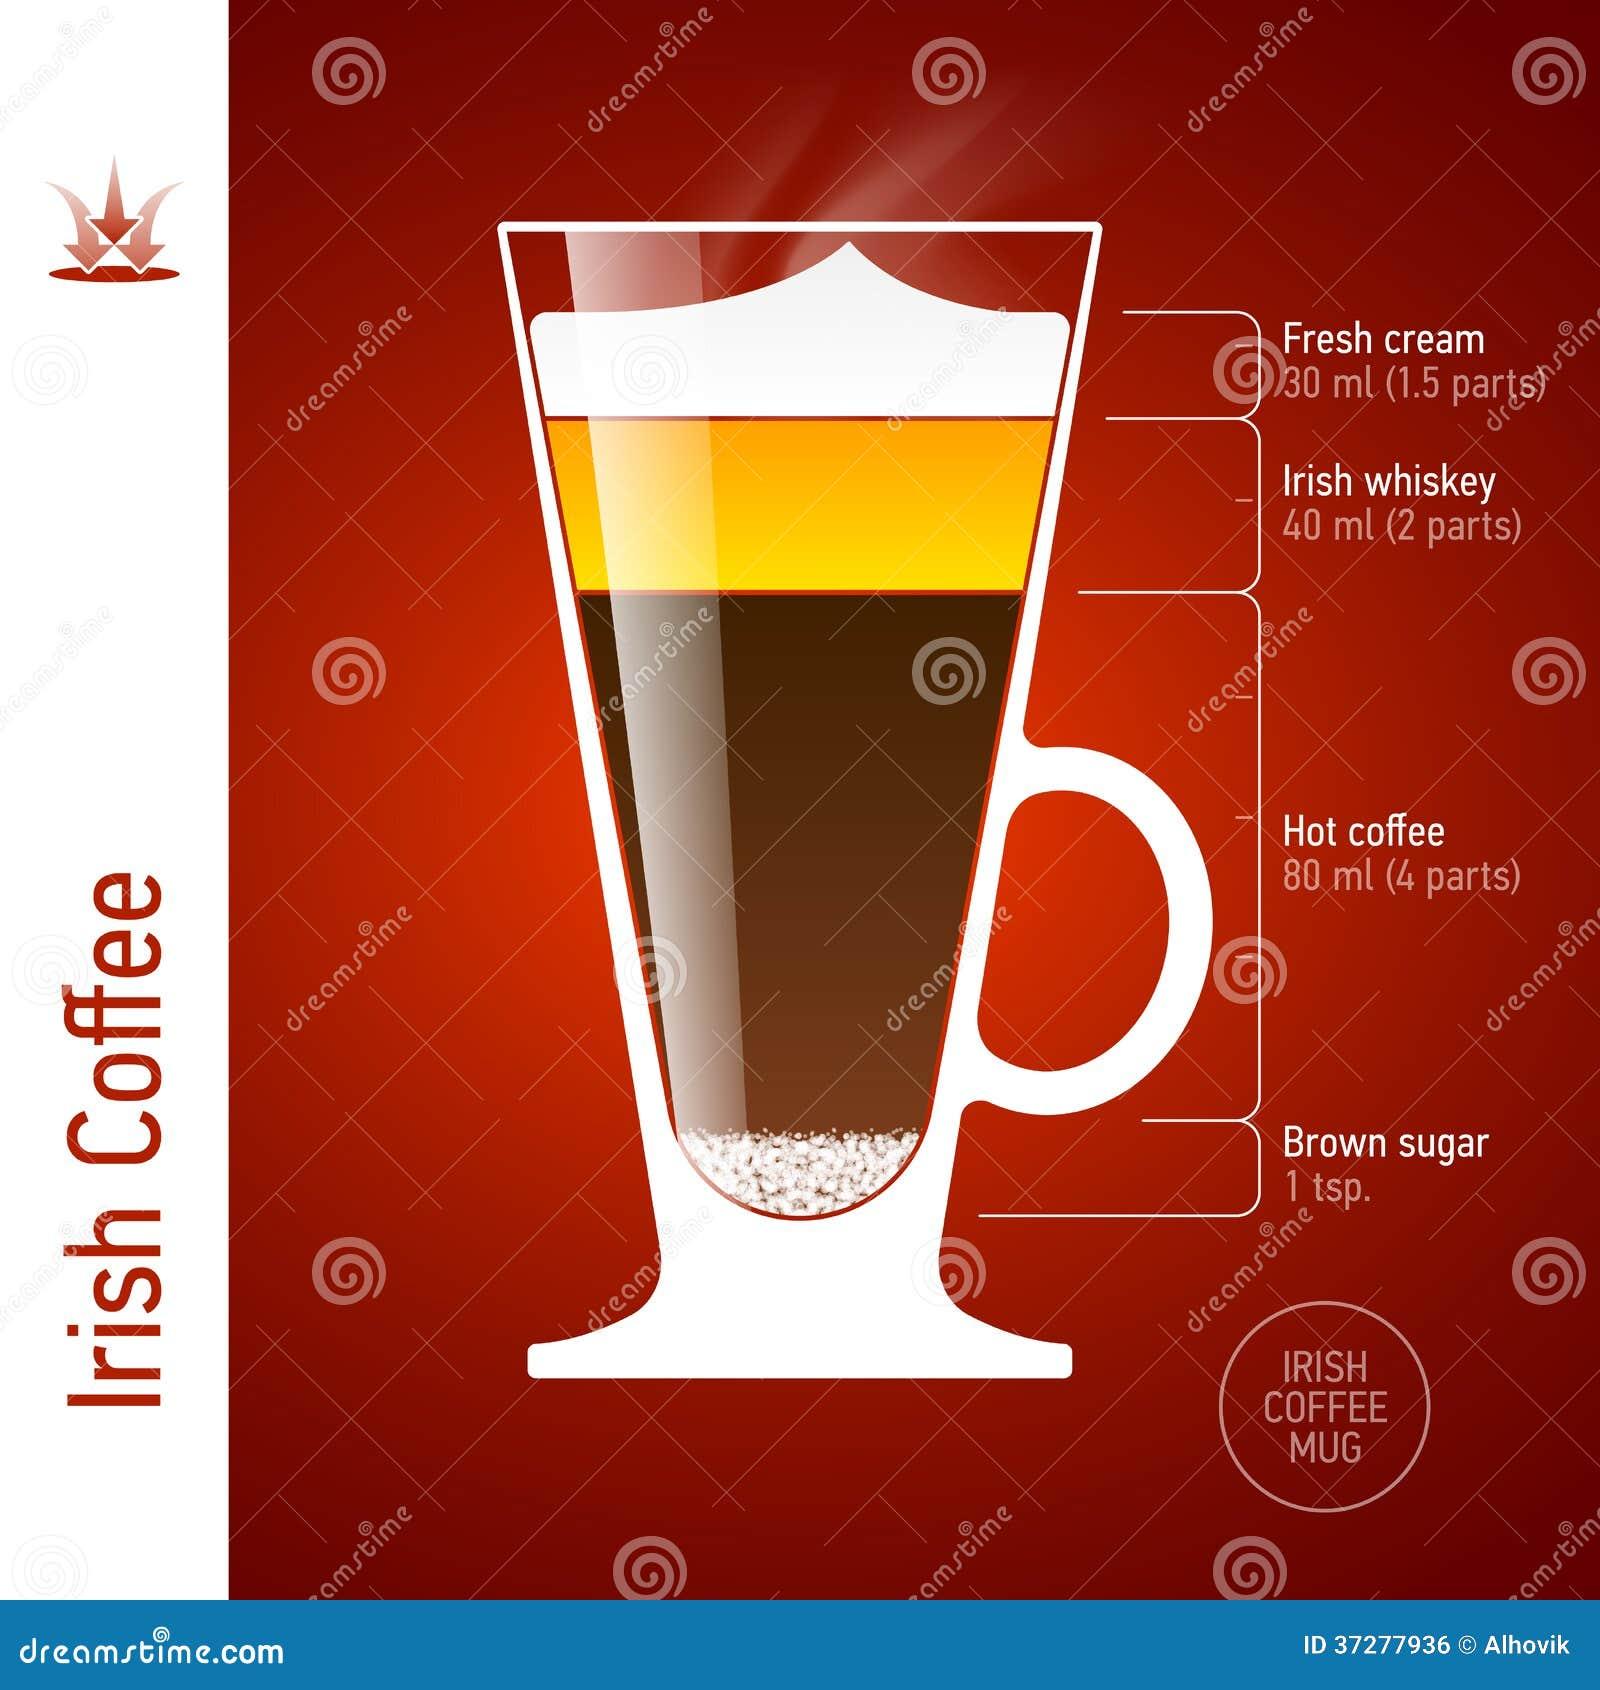 Irish Coffee Cocktail Royalty Free Stock Image - Image: 37277936